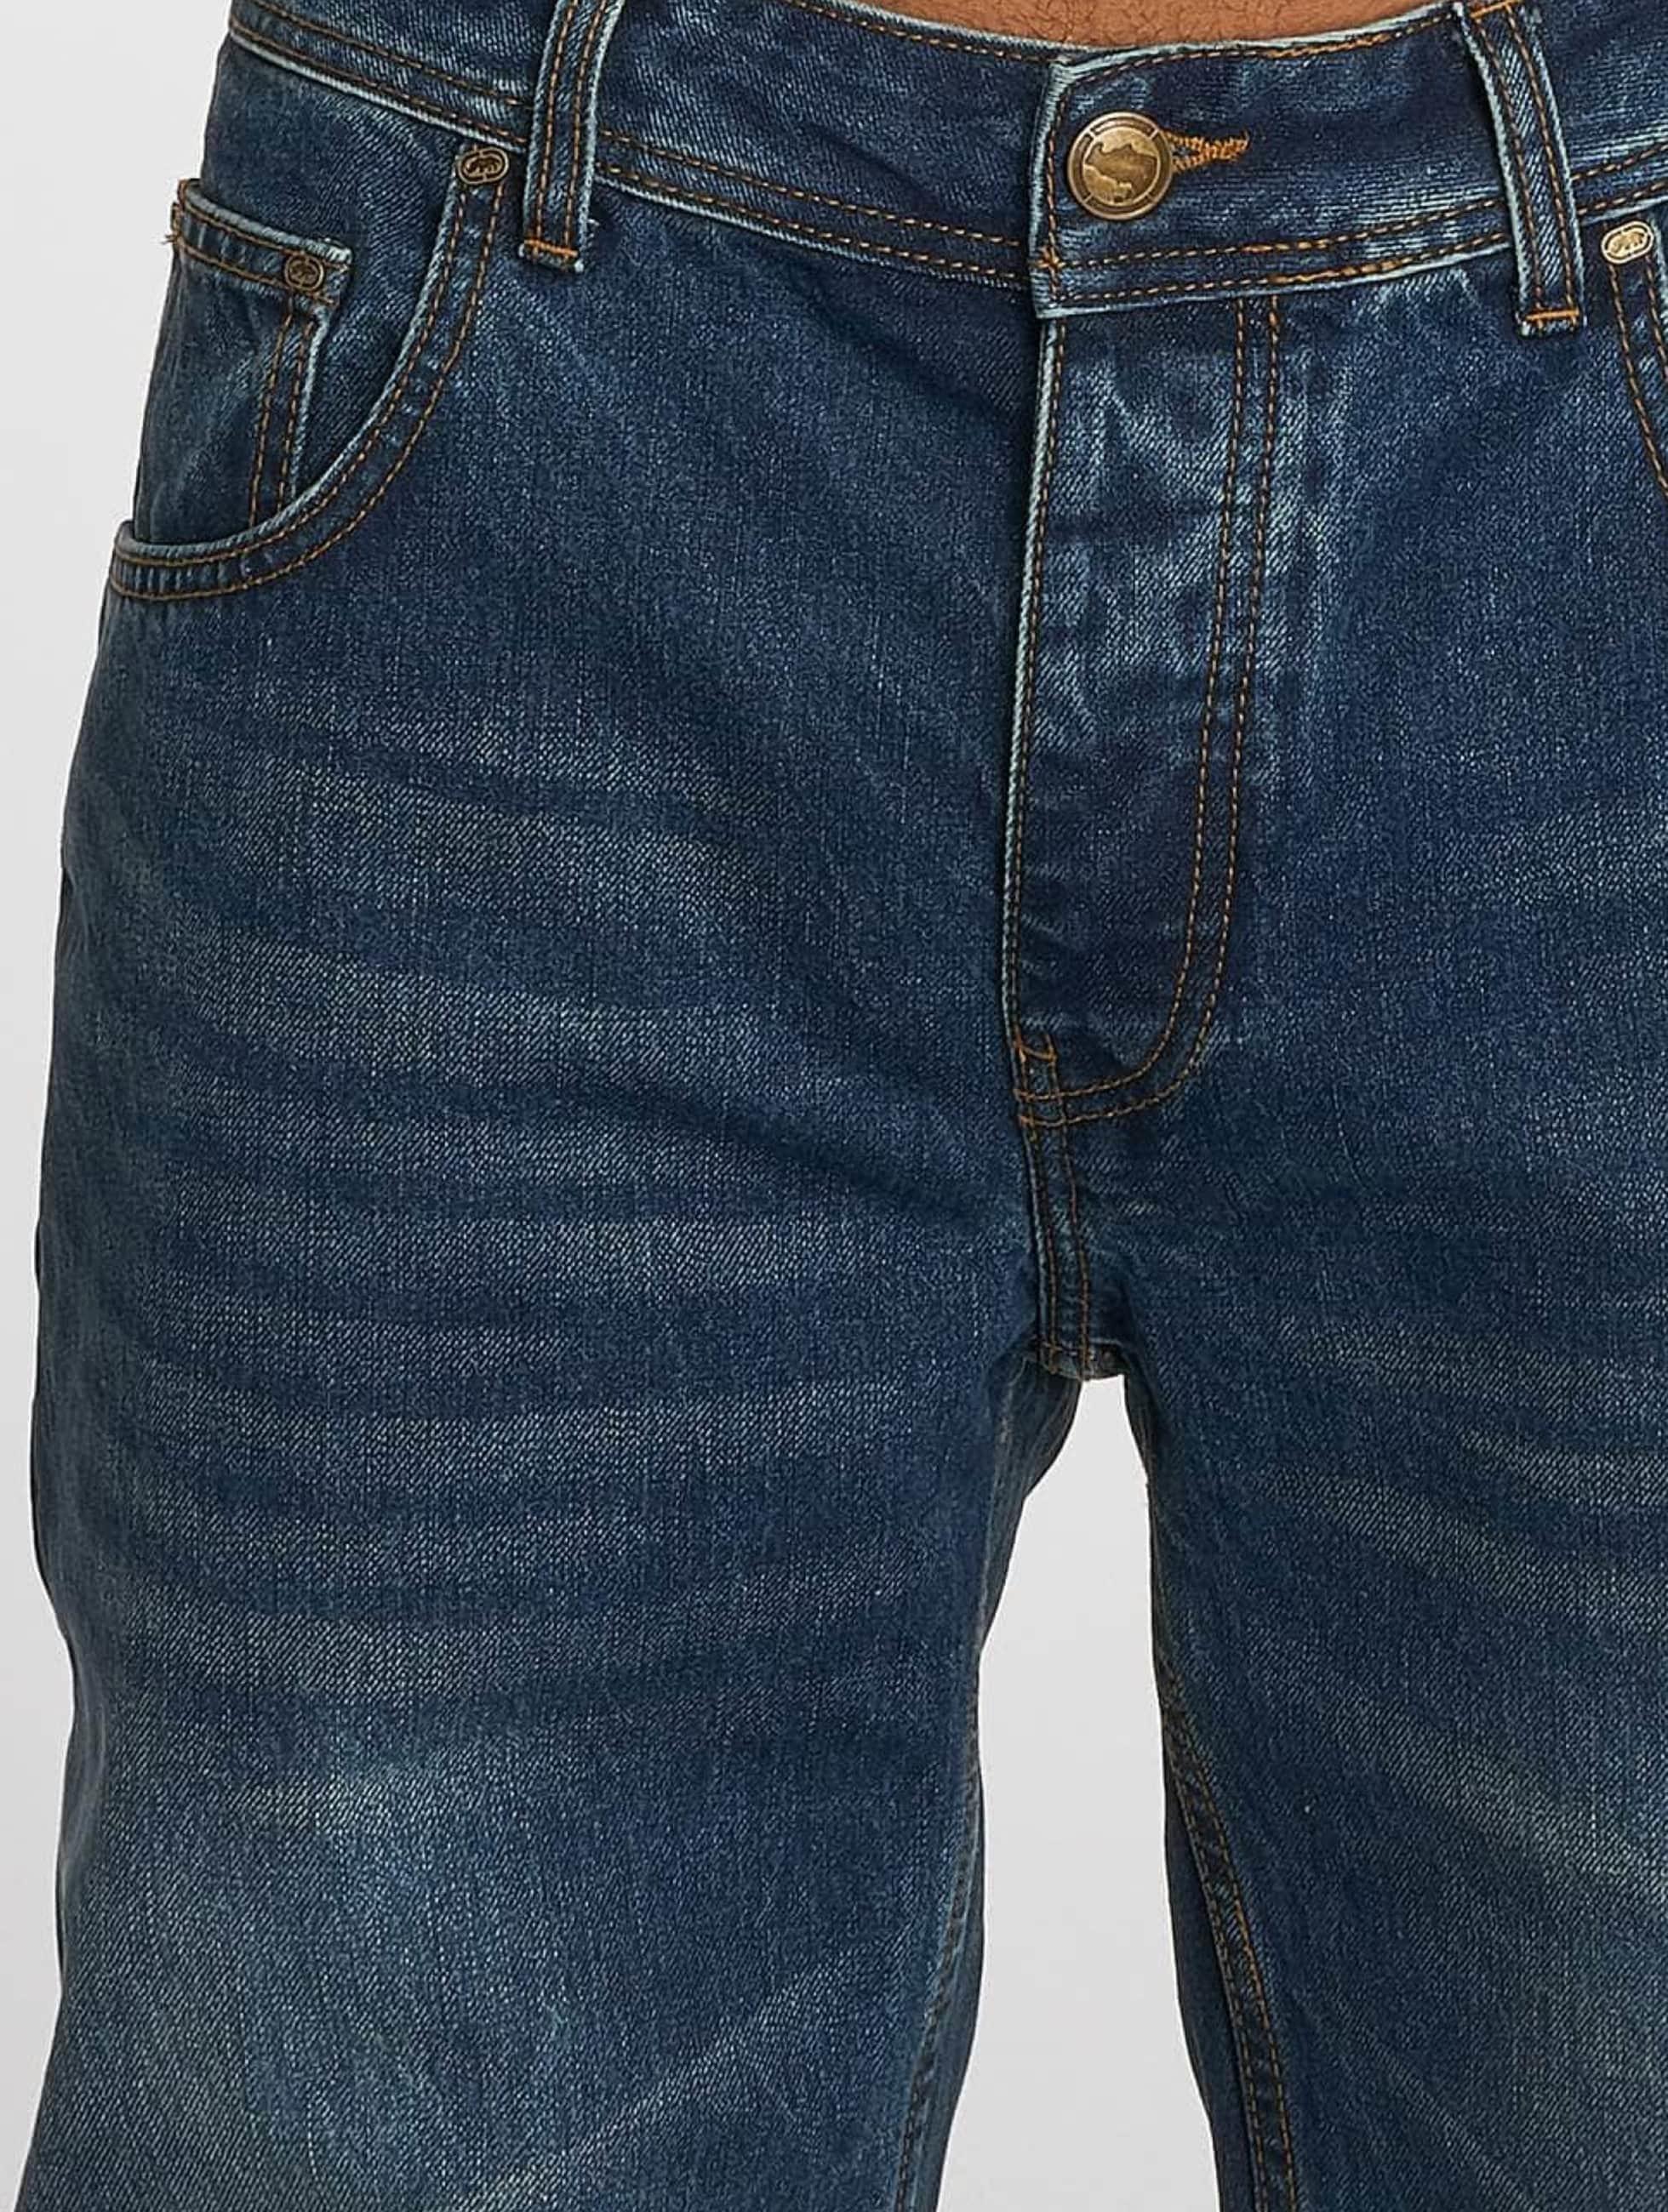 Ecko-Unltd-Uomini-Jeans-Jeans-larghi-Hang